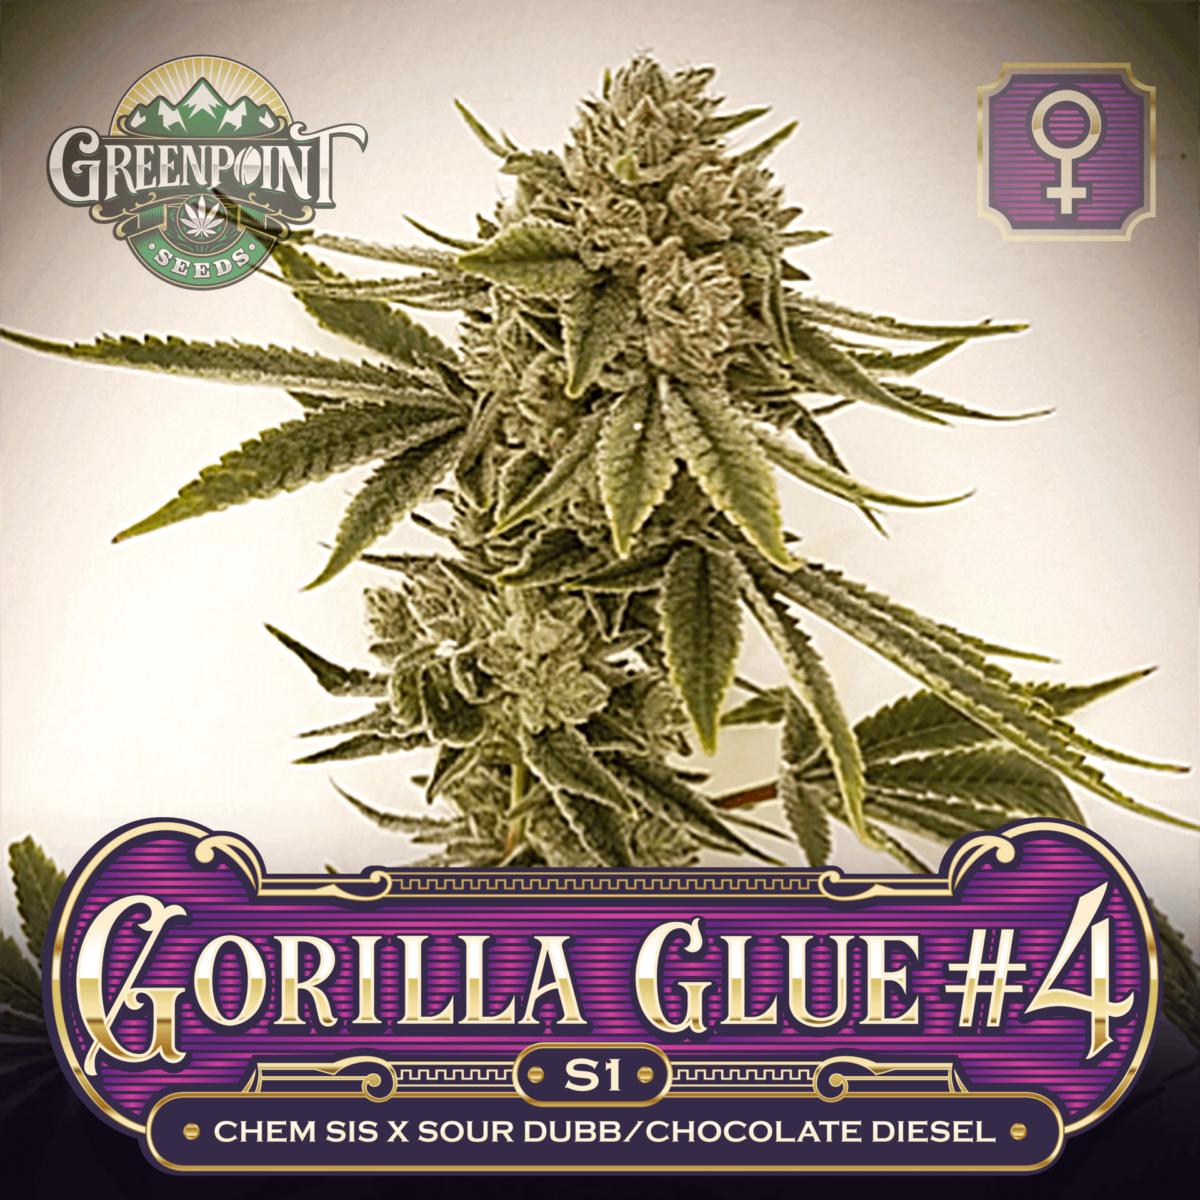 Gorilla Glue #4 x Gorilla Glue #4 Seeds - Gorilla Glue S1 Feminized Cannabis Seeds - US Seed Bank